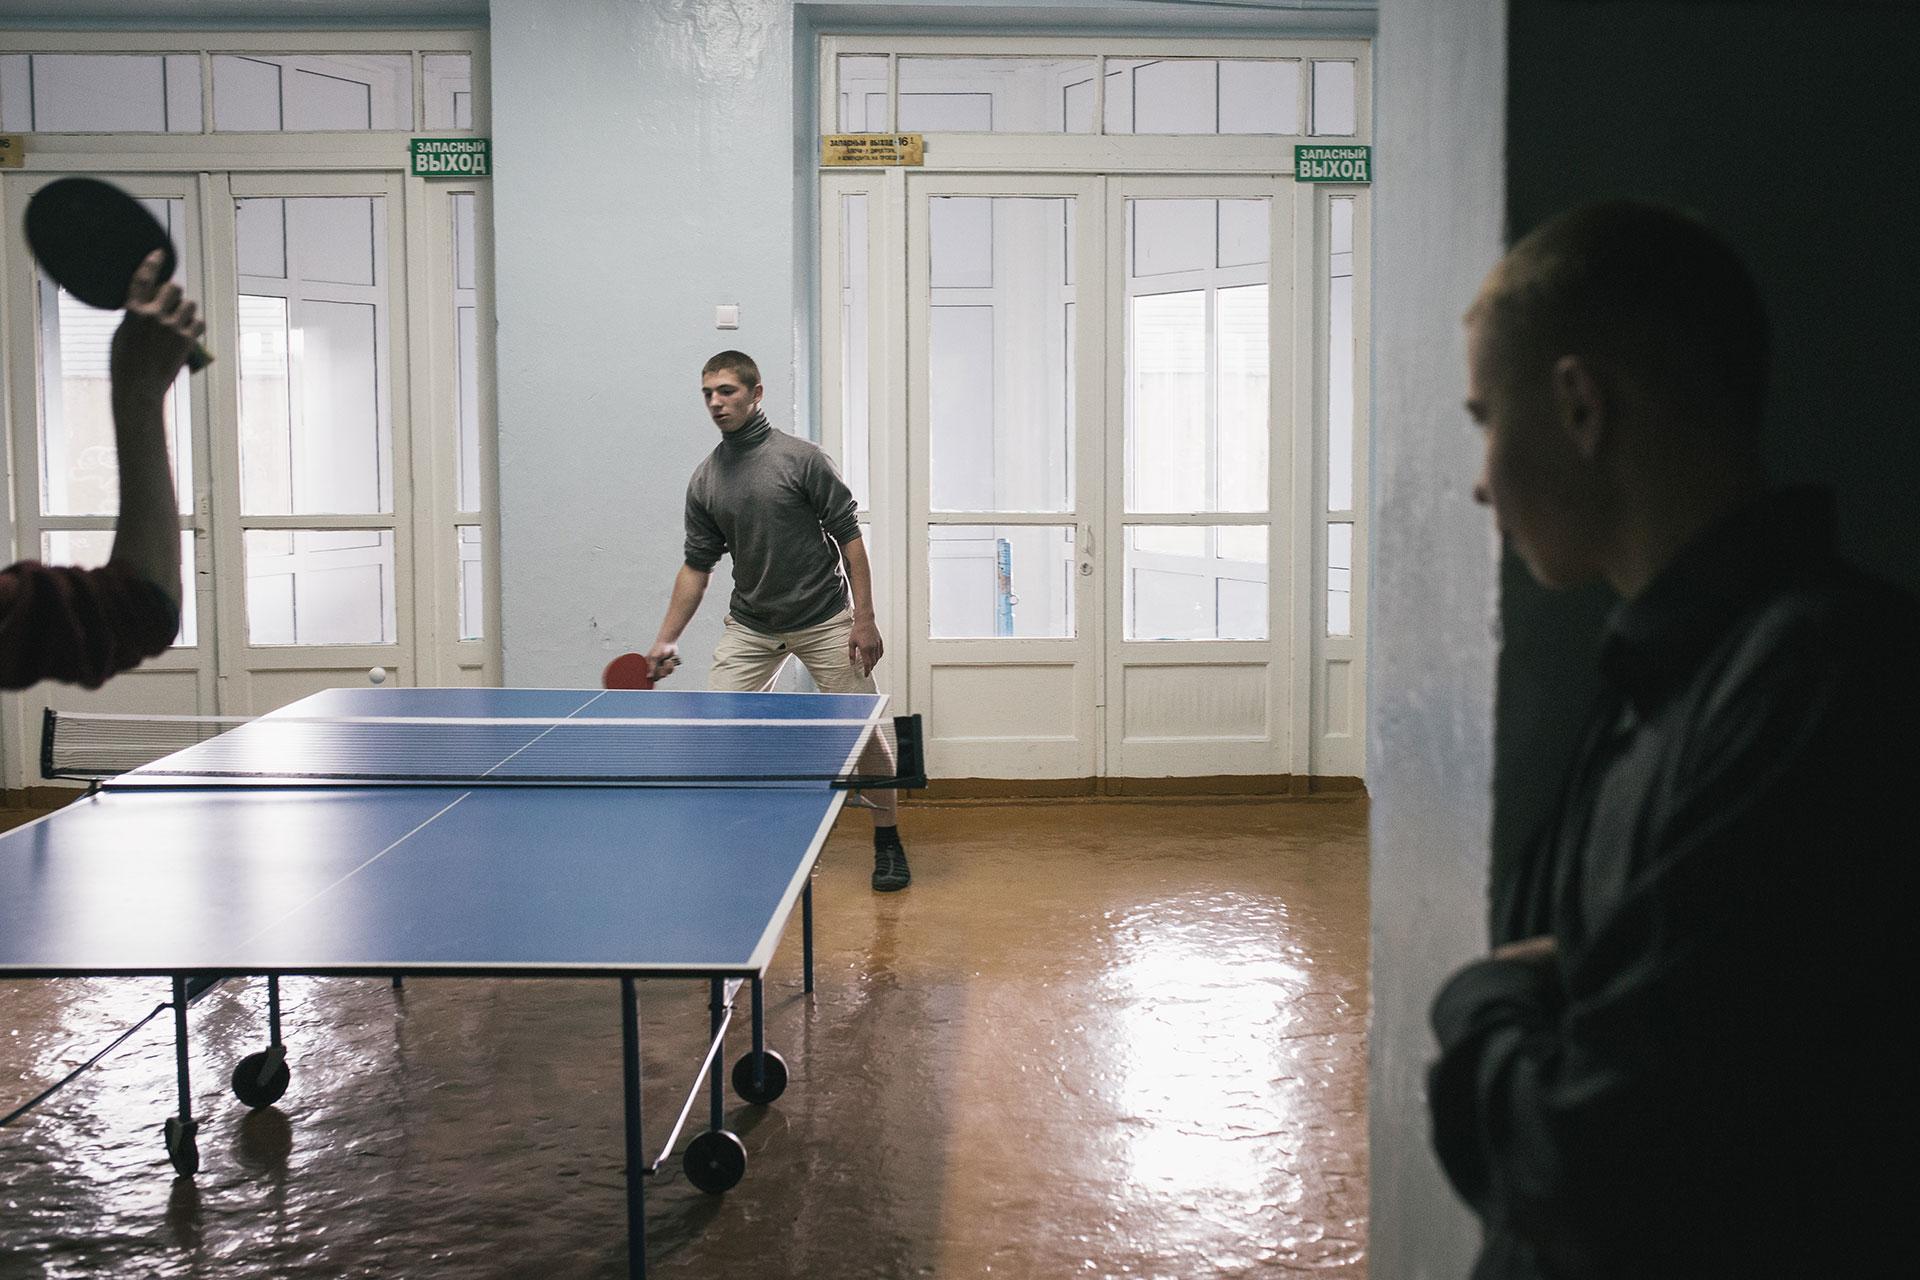 El ping pong es muy popular.